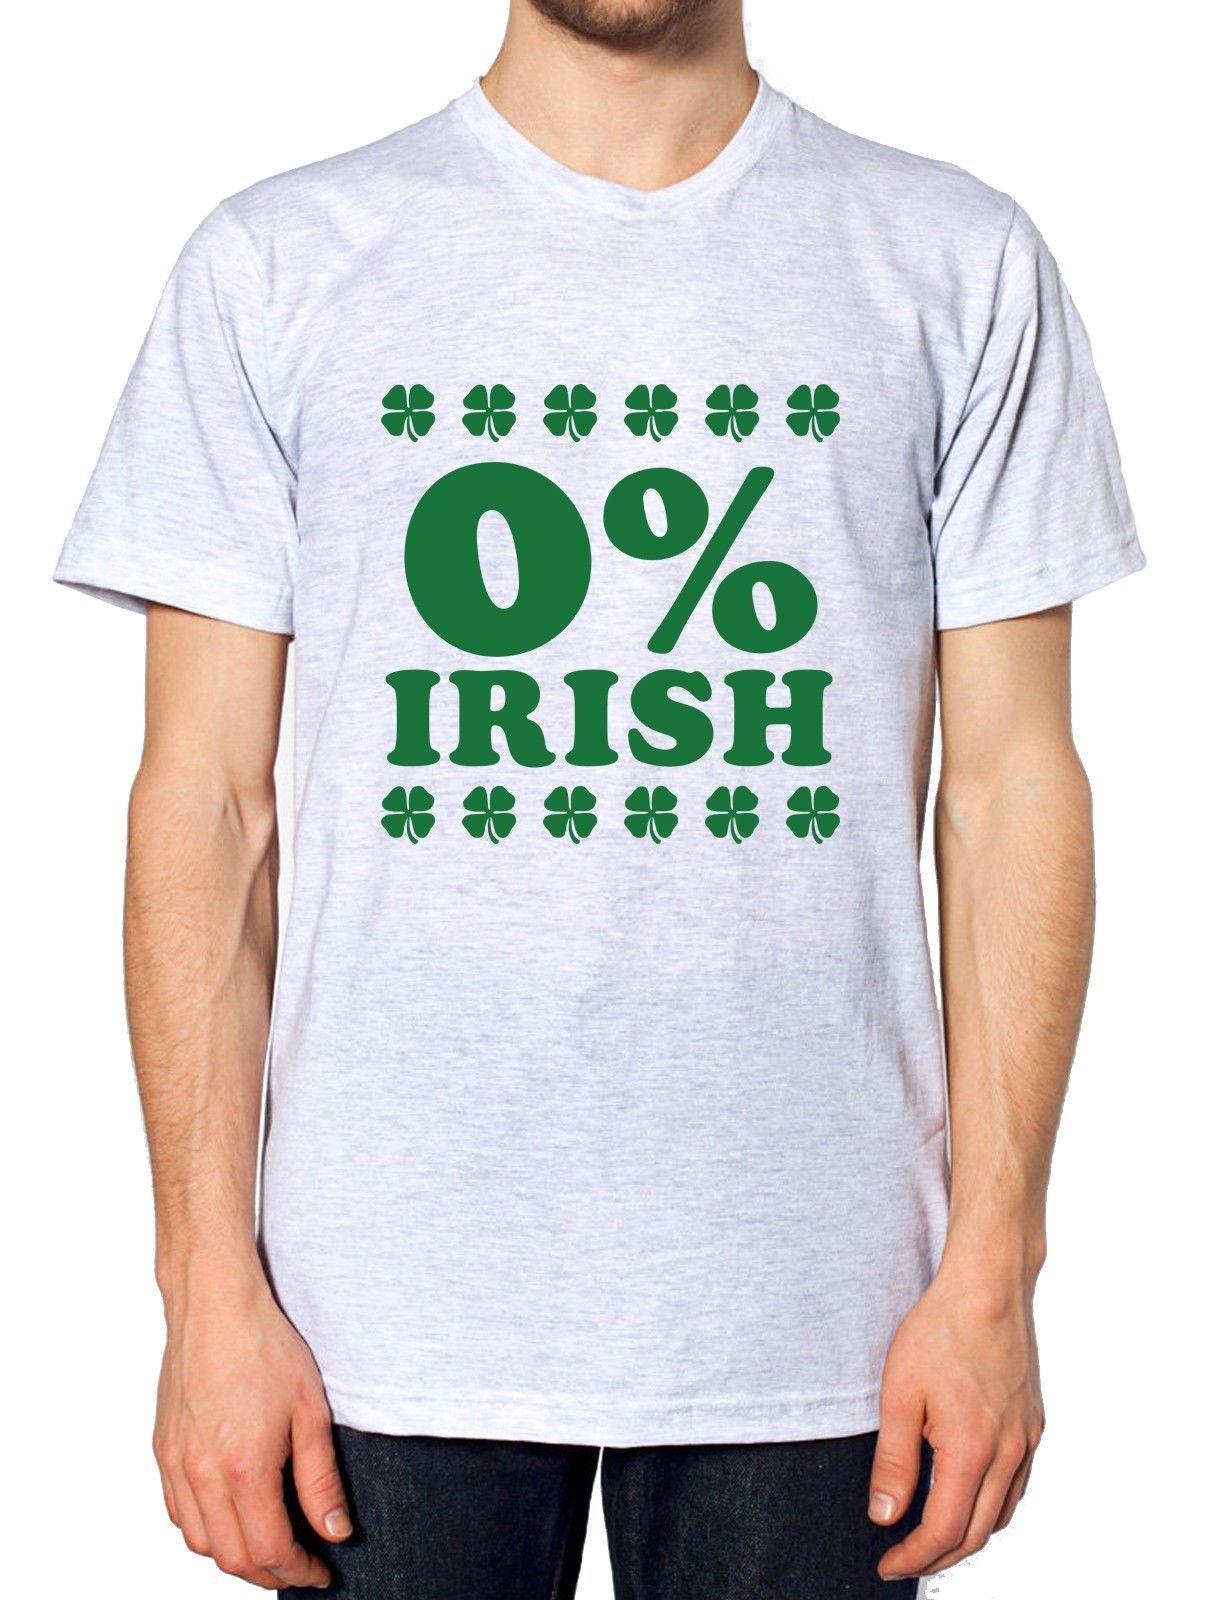 412104c7a1213 0% Irish T Shirt St Patricks Day Funny Outfit Top Men Women Percent Irish  Paddy Classic Quality High t-shirt